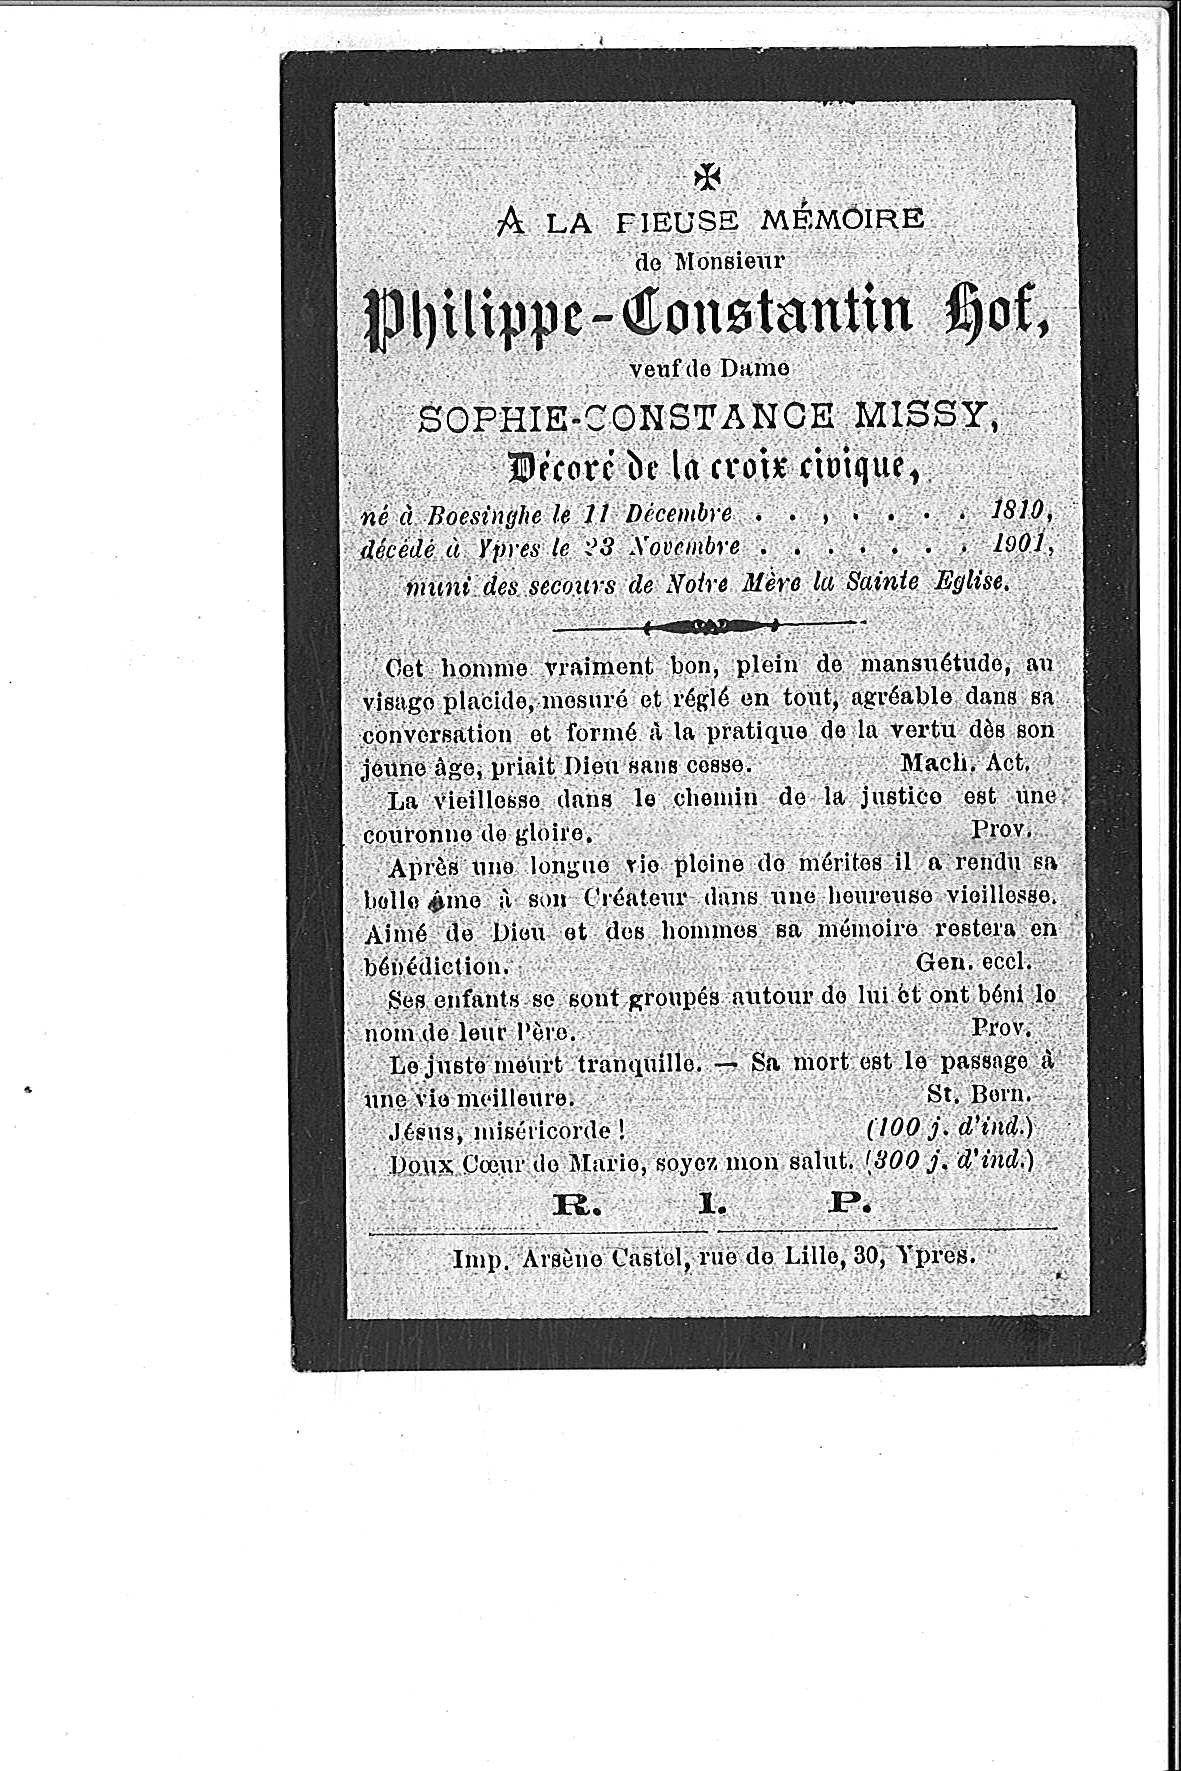 Philippe-Constantin(1901)20151002161158_00027.jpg